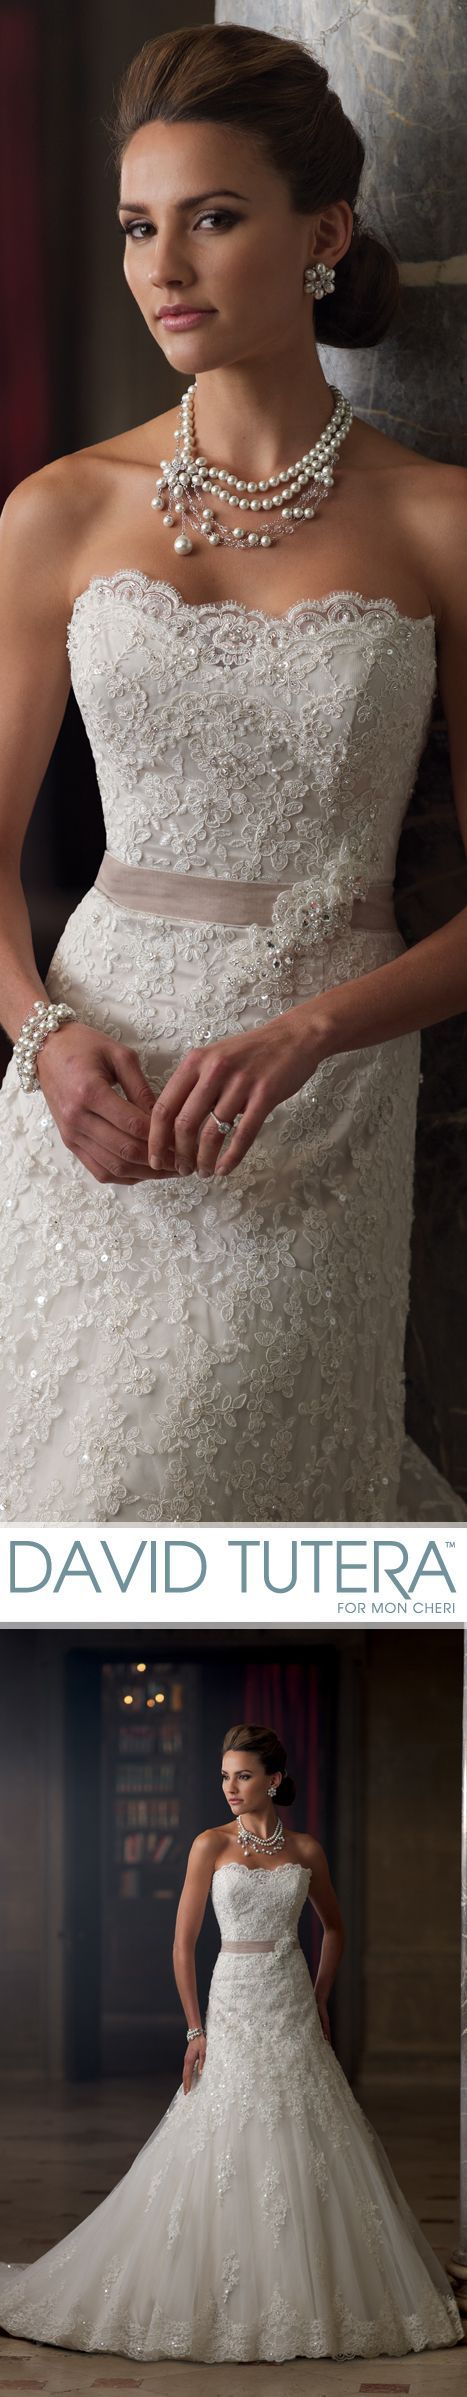 Style No. 213261 ~ Charlene, Wedding Dresses 2013 Collection (original pin by lita villanueva: https://br.pinterest.com/pin/323344448222450196/)